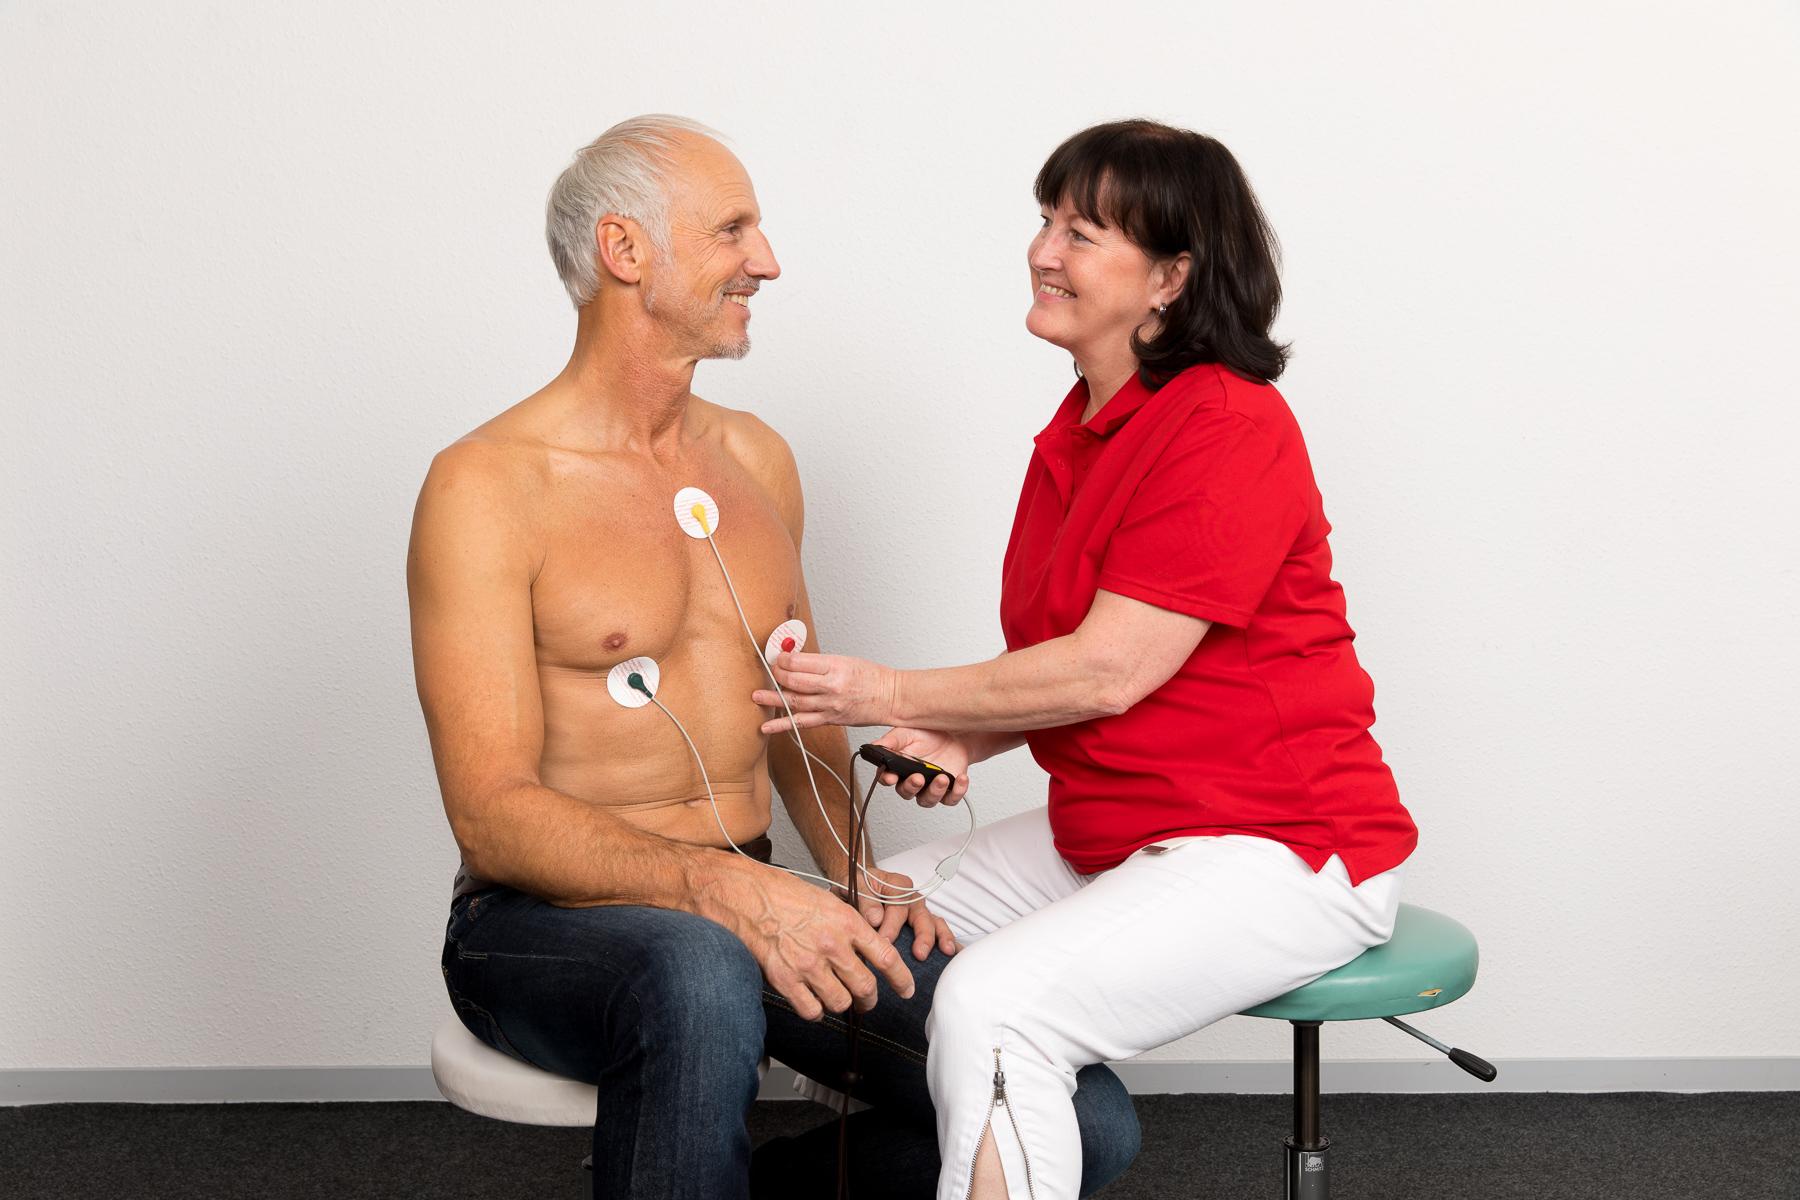 Kerstin legt ein Langzeit-EKG an